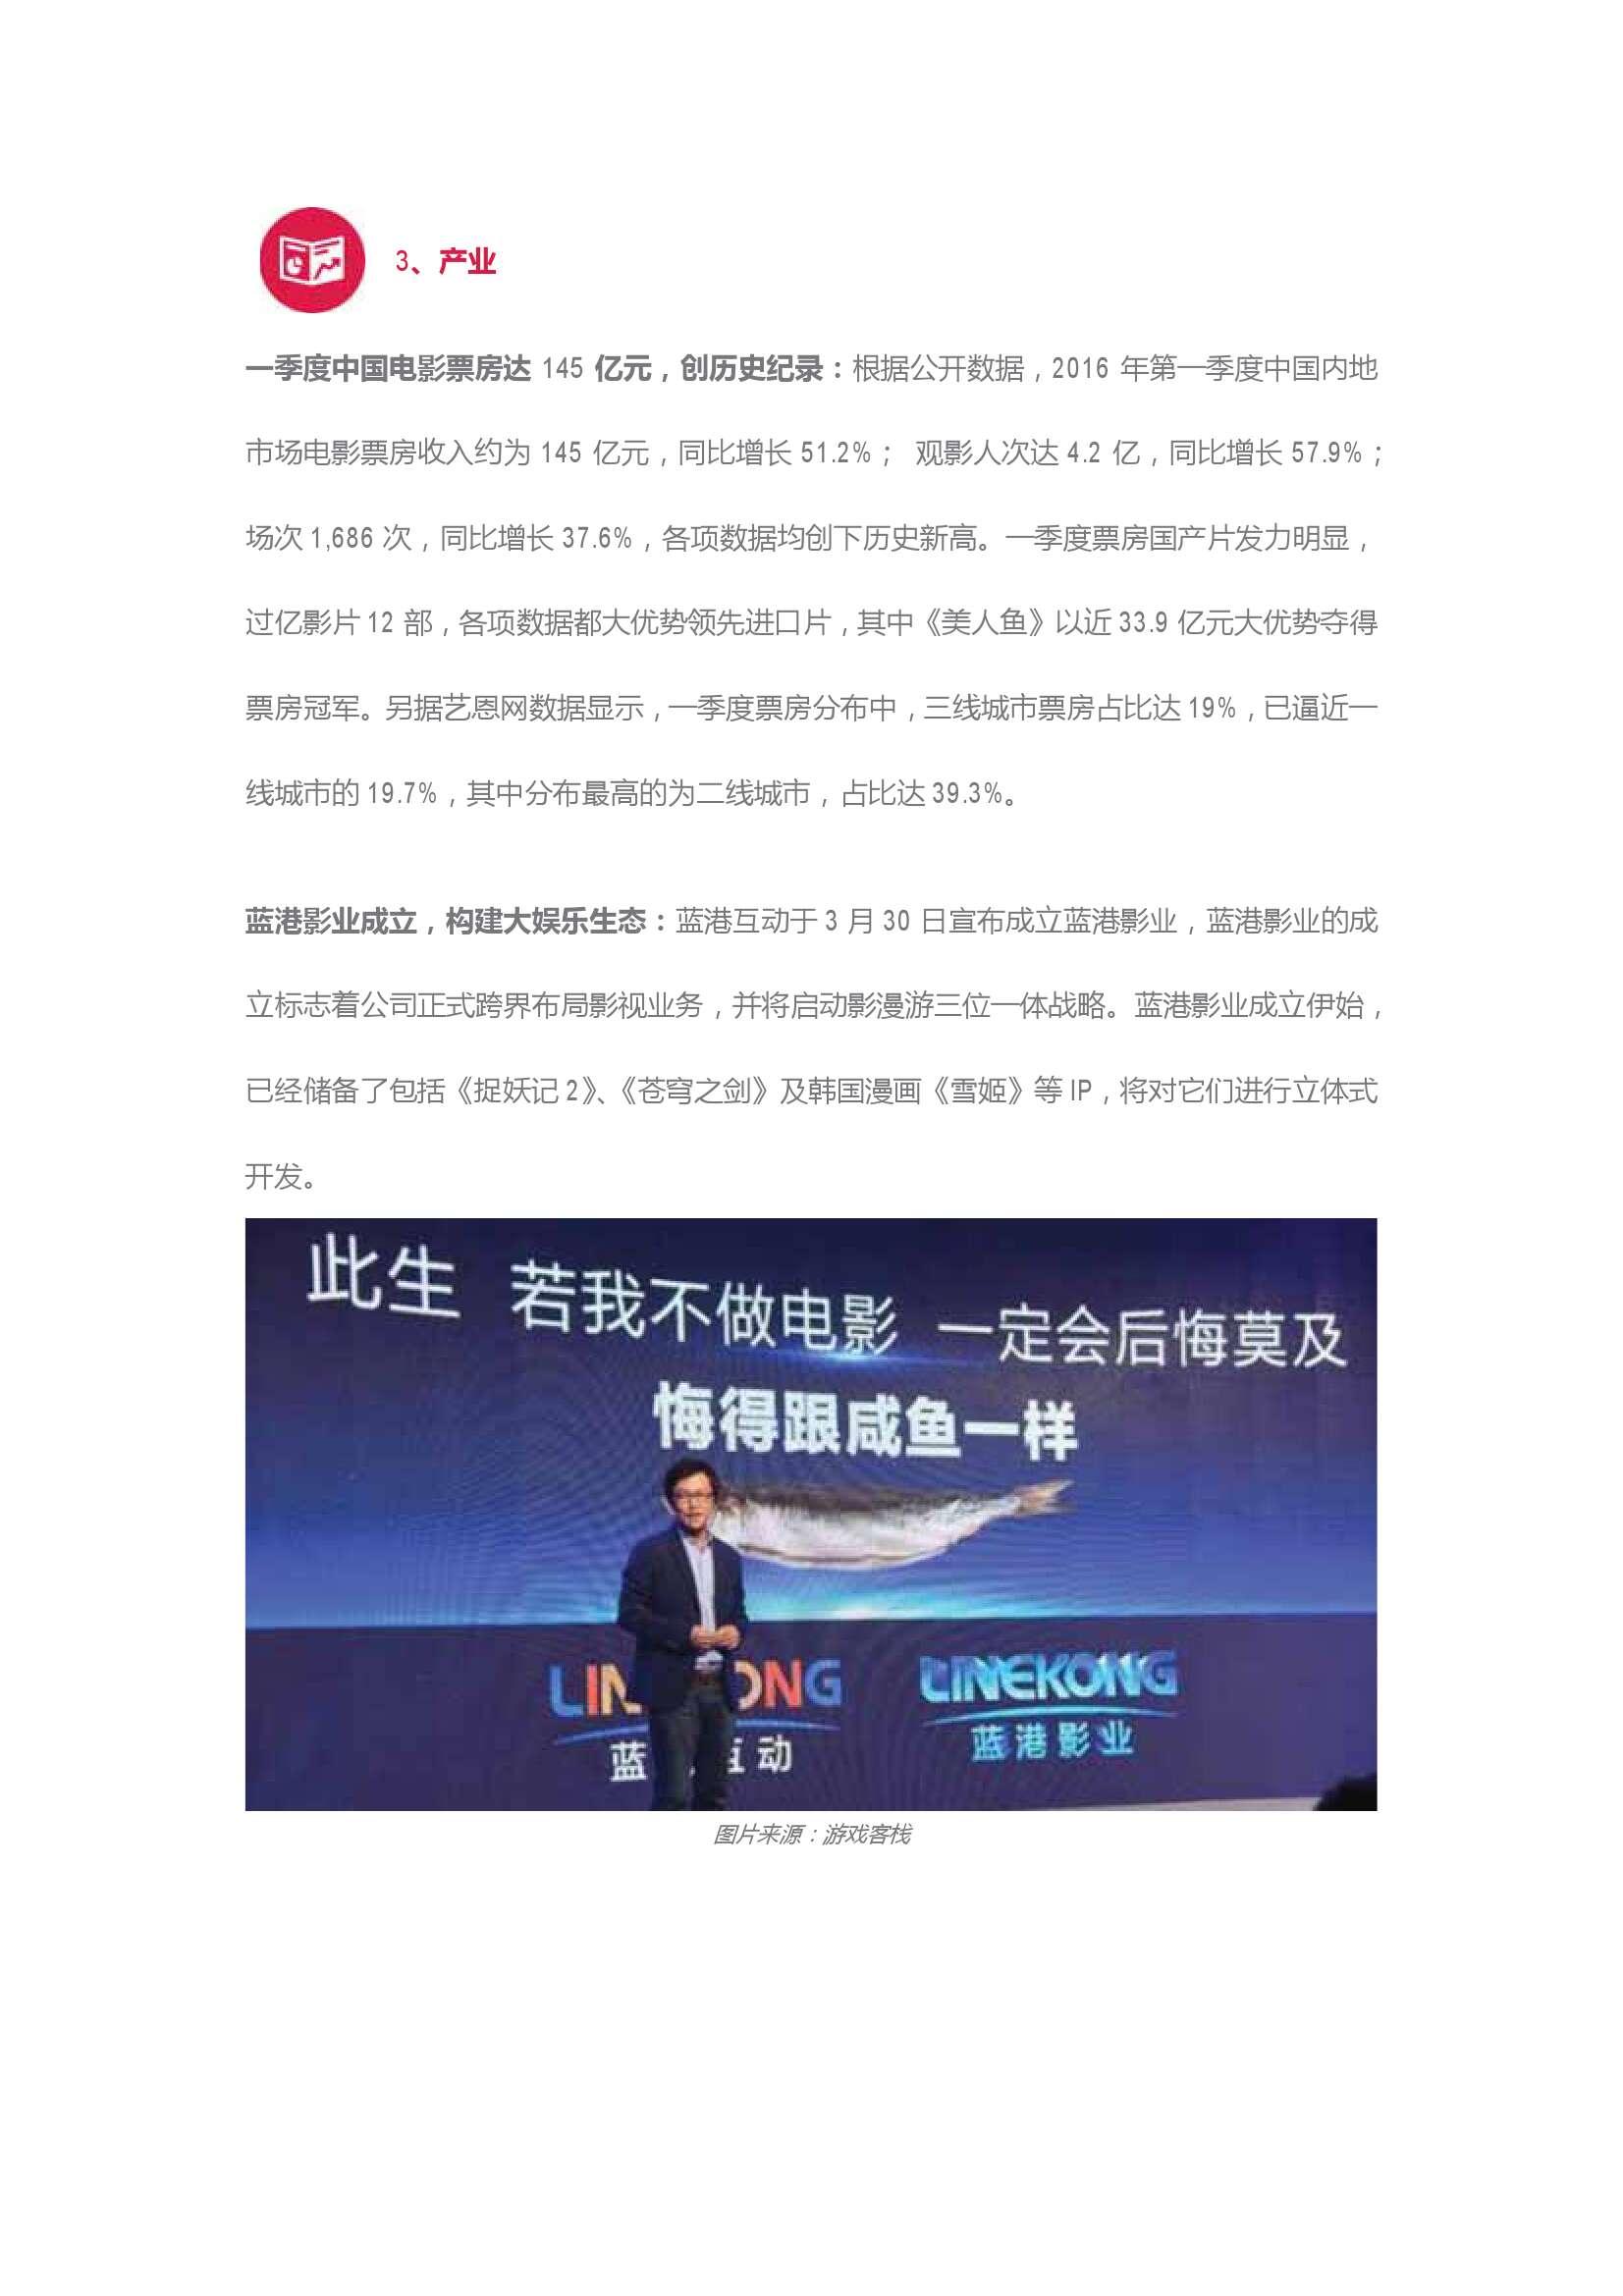 2016Q1中国娱乐产业季度观察_000008